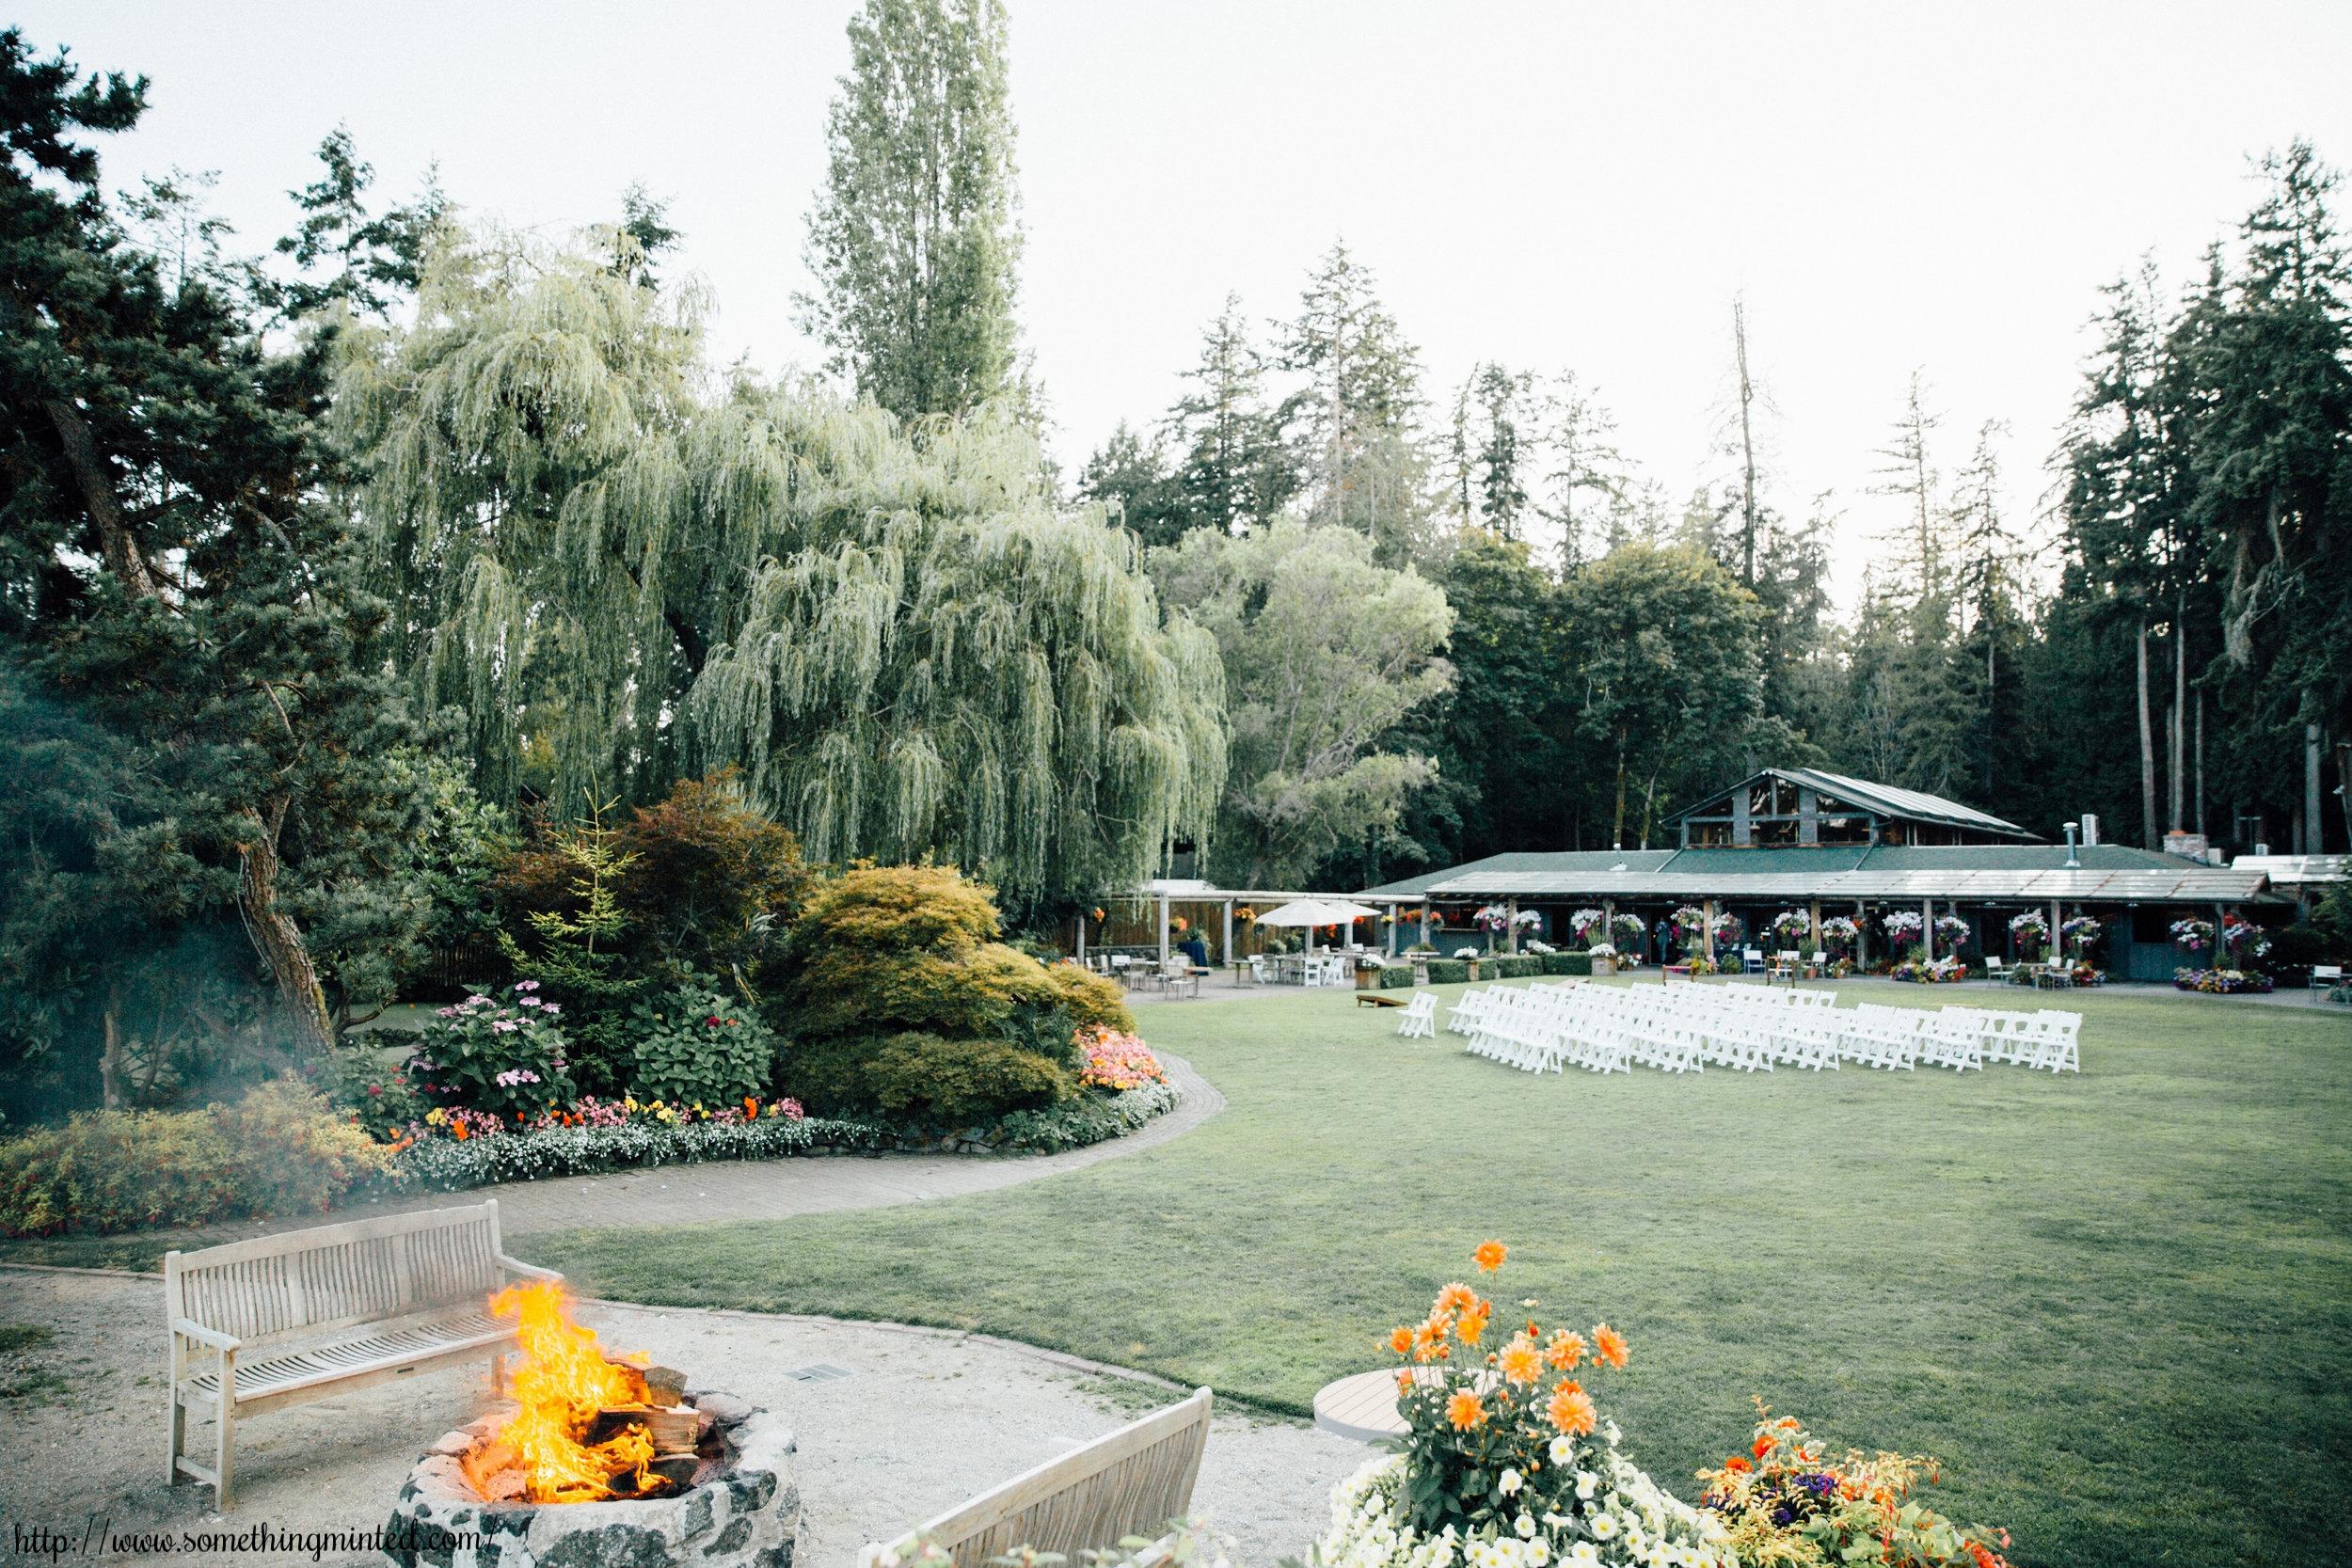 Kiana Lodge Wedding - Seattle Wedding Photographer - Something Minted Photography-684.jpg